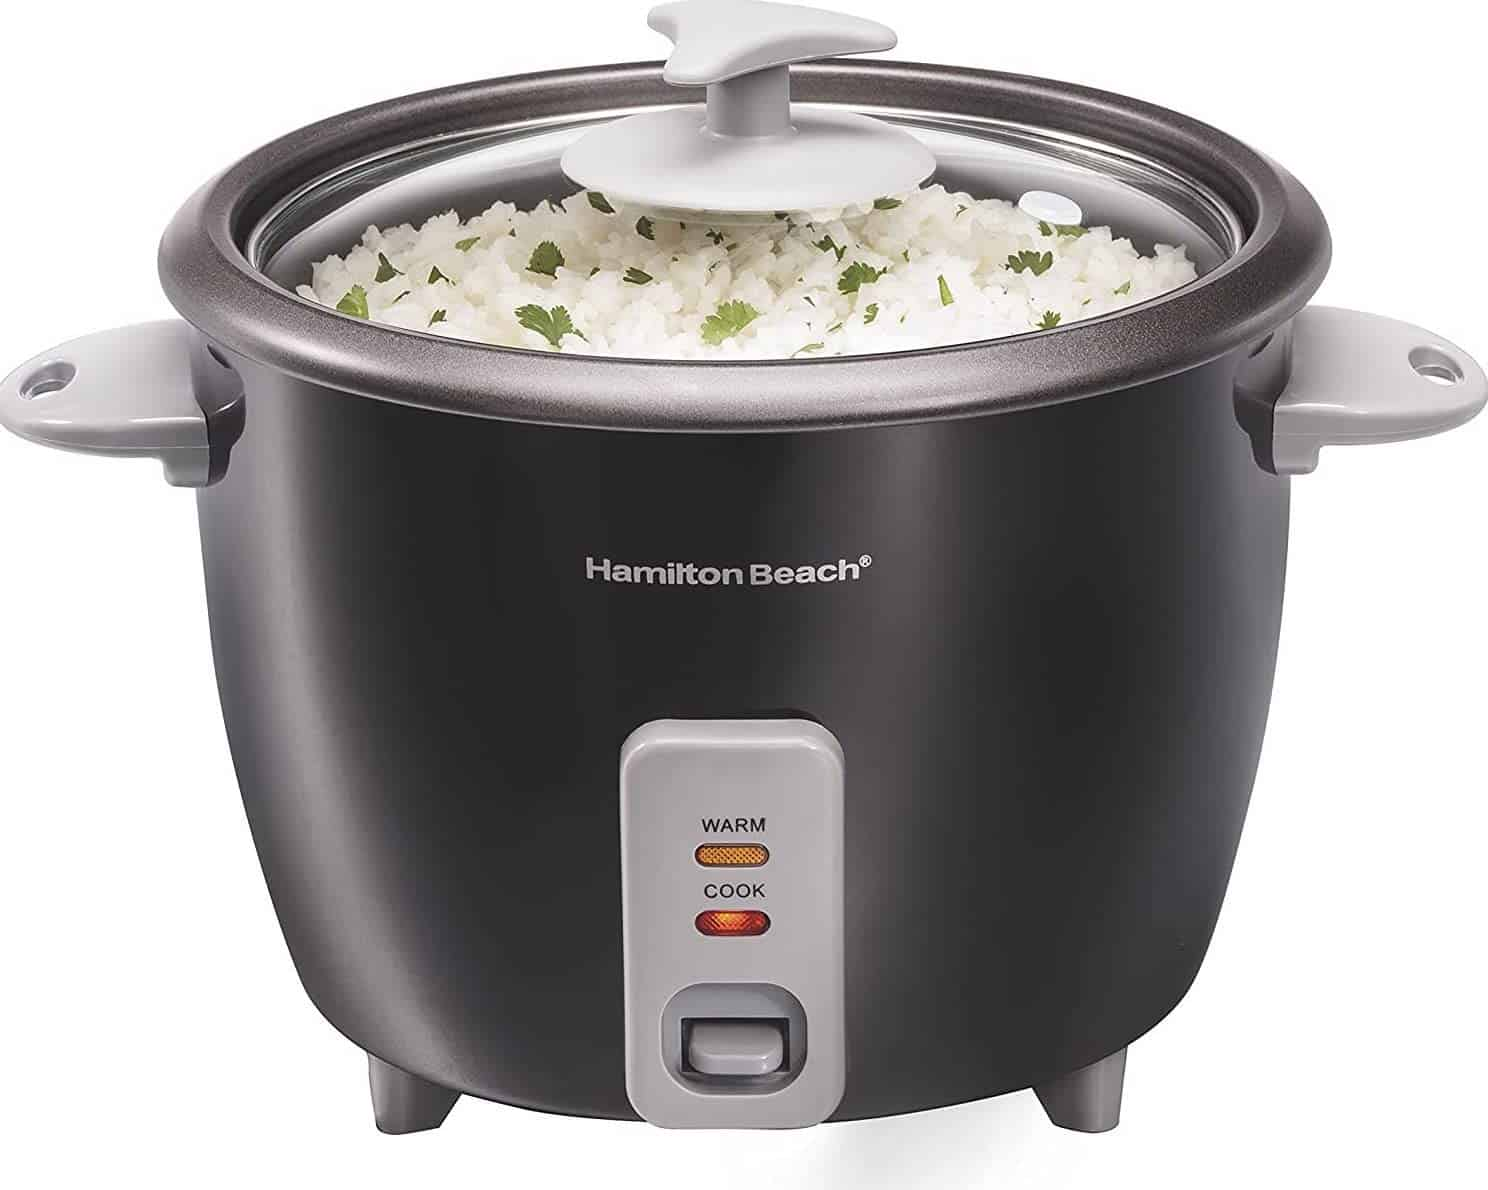 Hamilton Beach 16-Cup Rice Cooker & Food Steamer